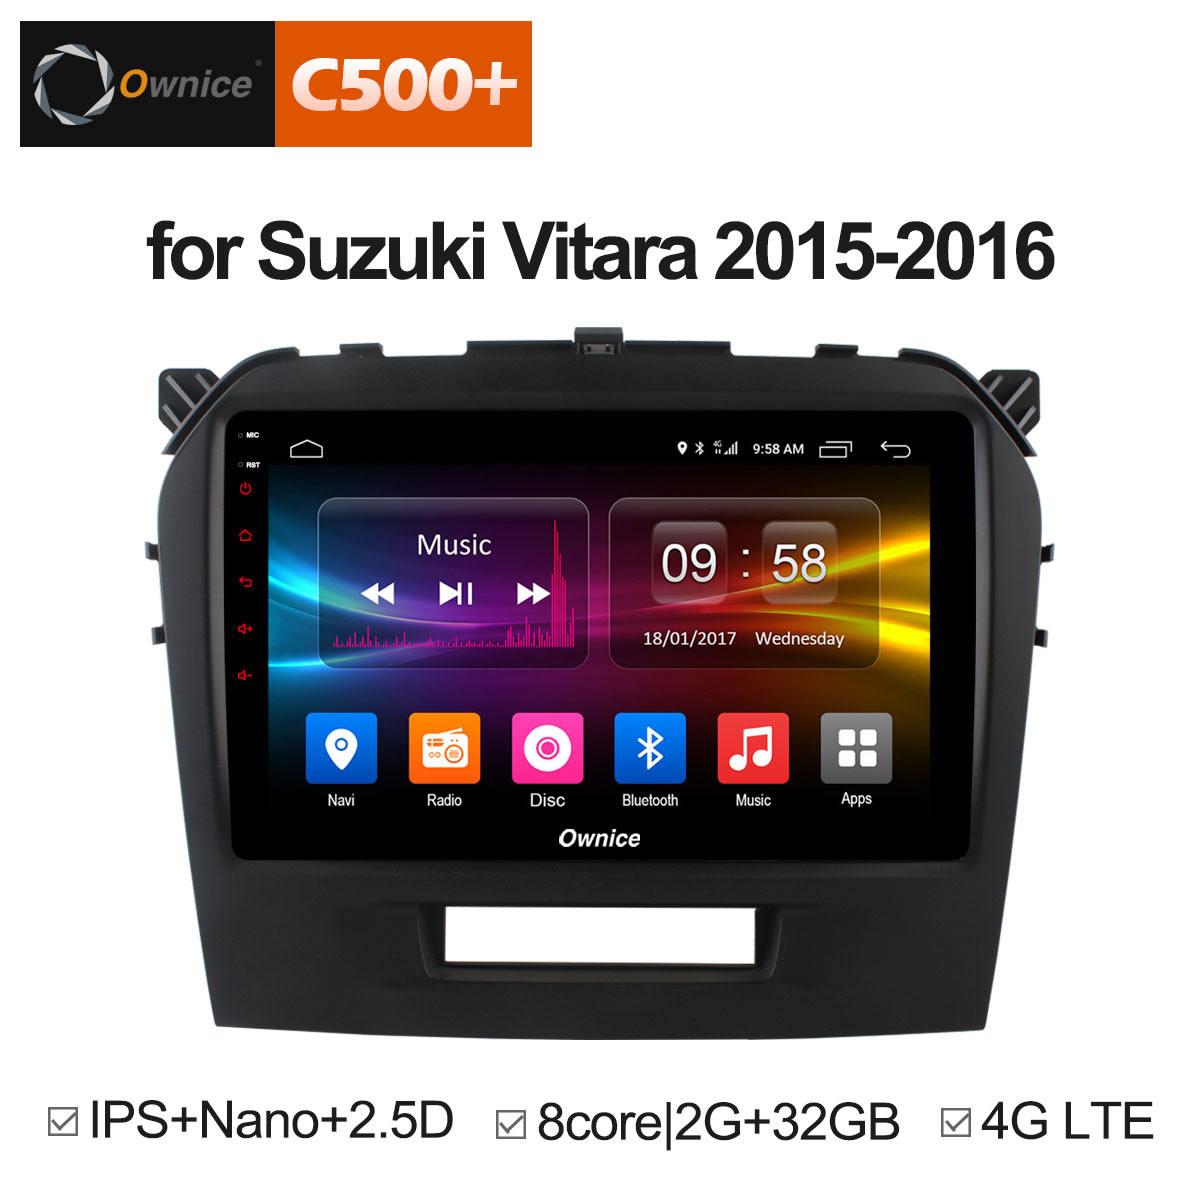 Штатная магнитола CARMEDIA OL-9621-8 (C500+) Suzuki Vitara 2015+ microphone